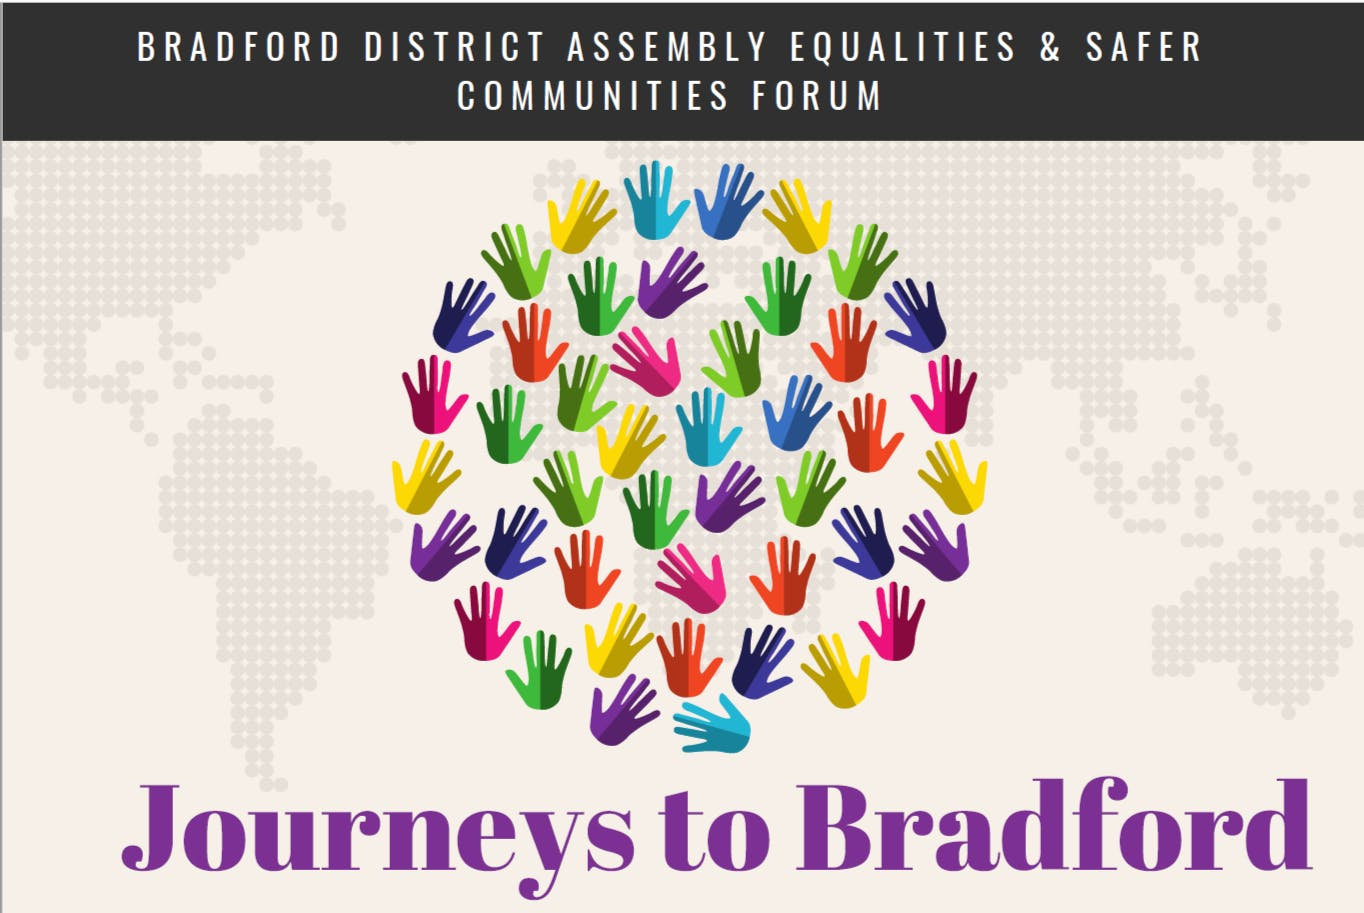 Journeys to Bradford